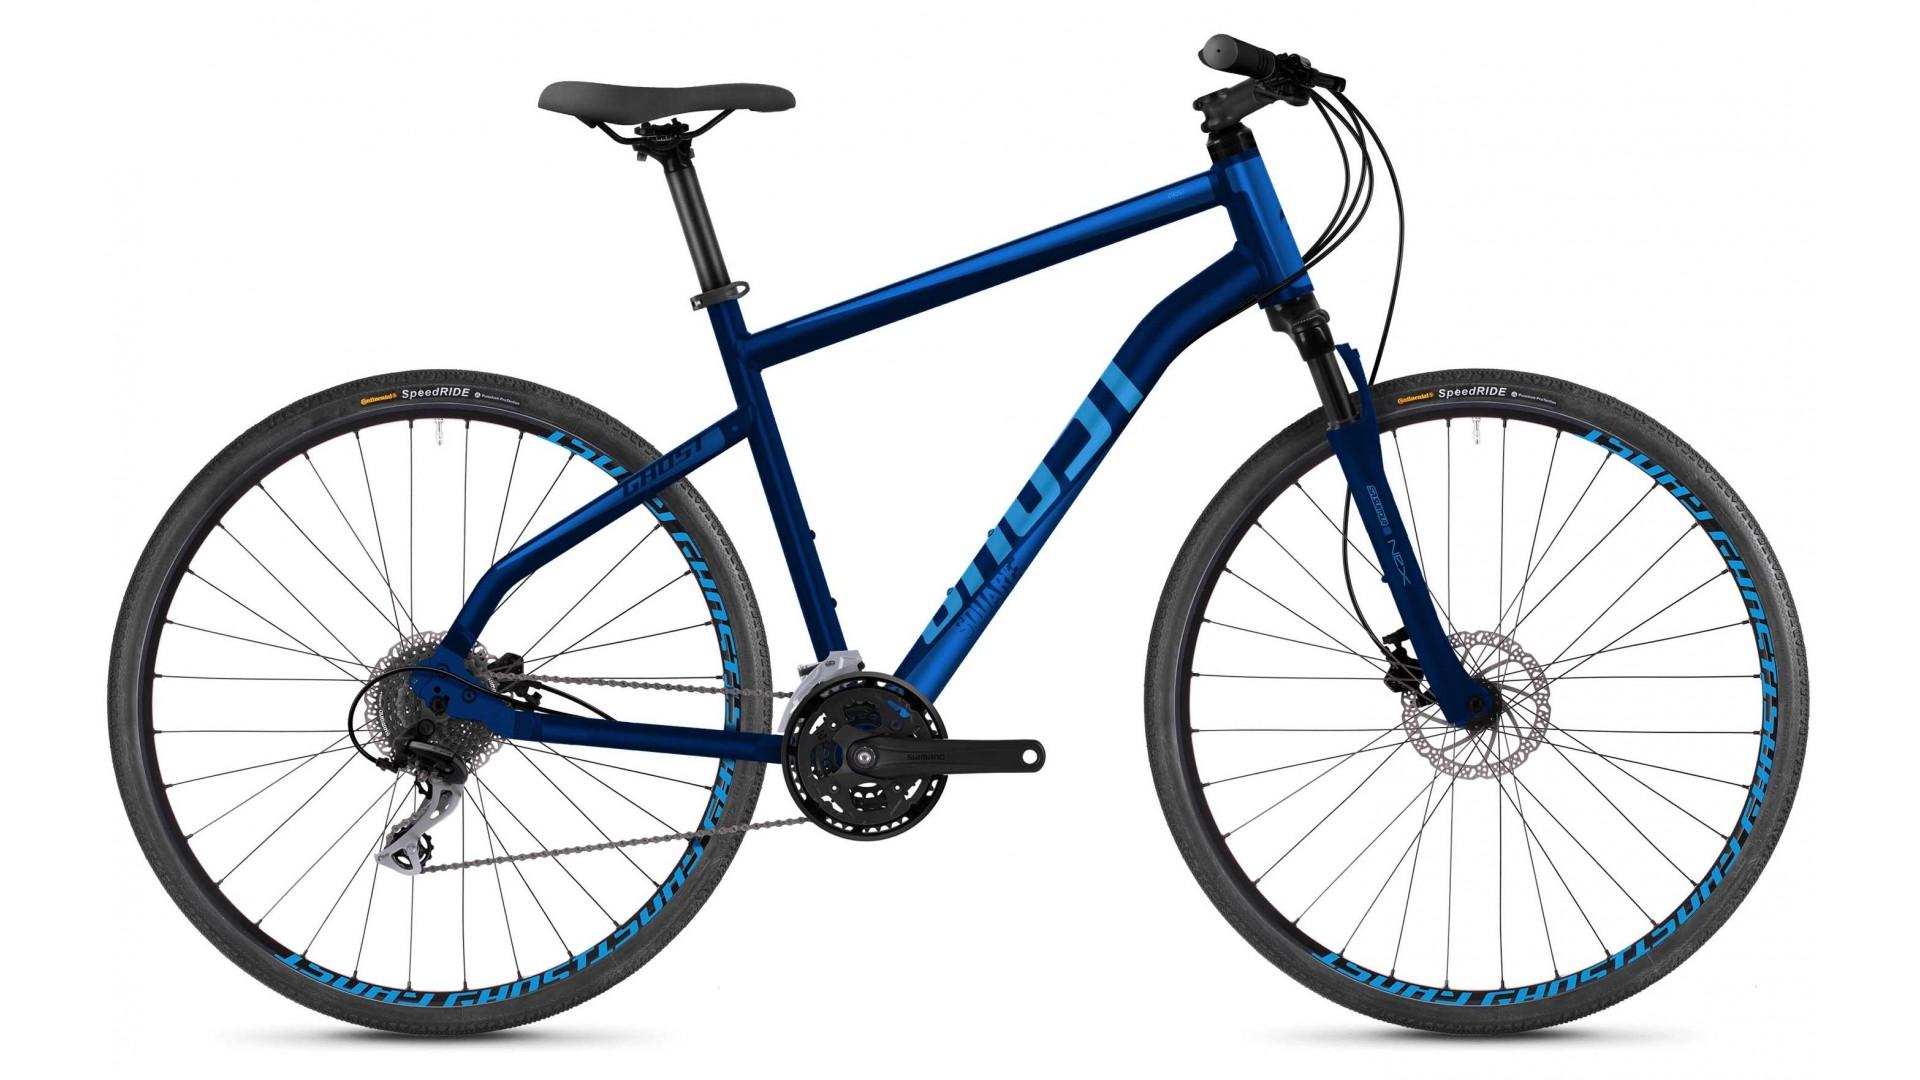 Велоспринт GHOST Square Cross 2.8 AL U night blue / navi blue / vibrant blue год 2018